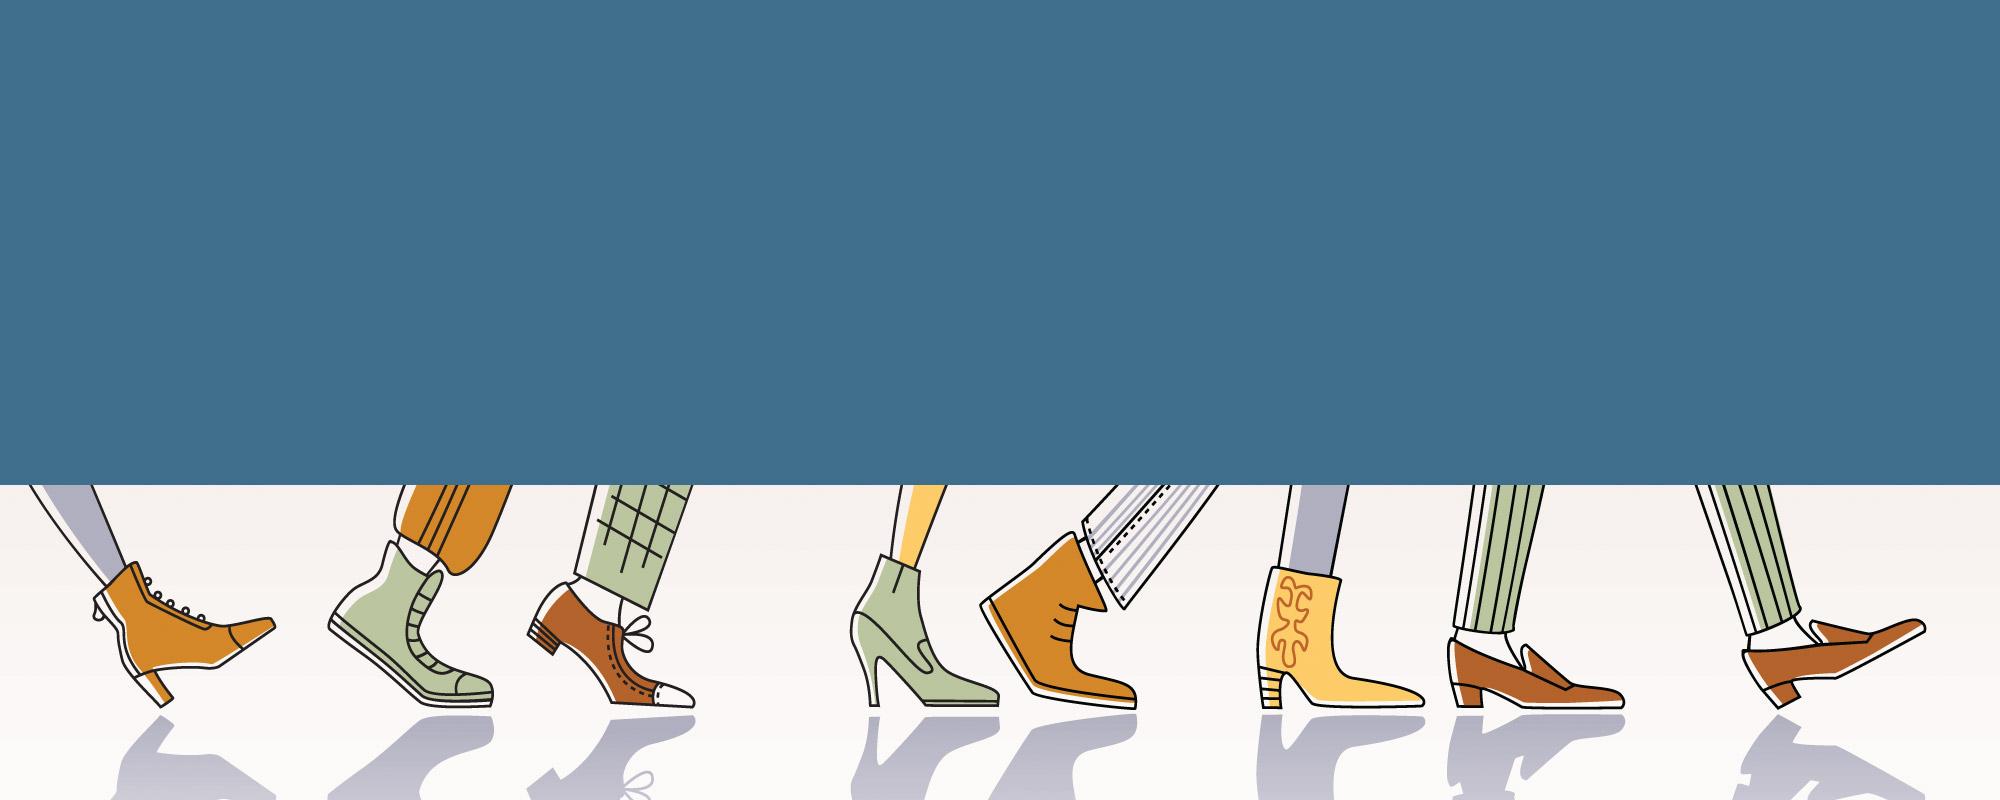 feet-banner-w-blue